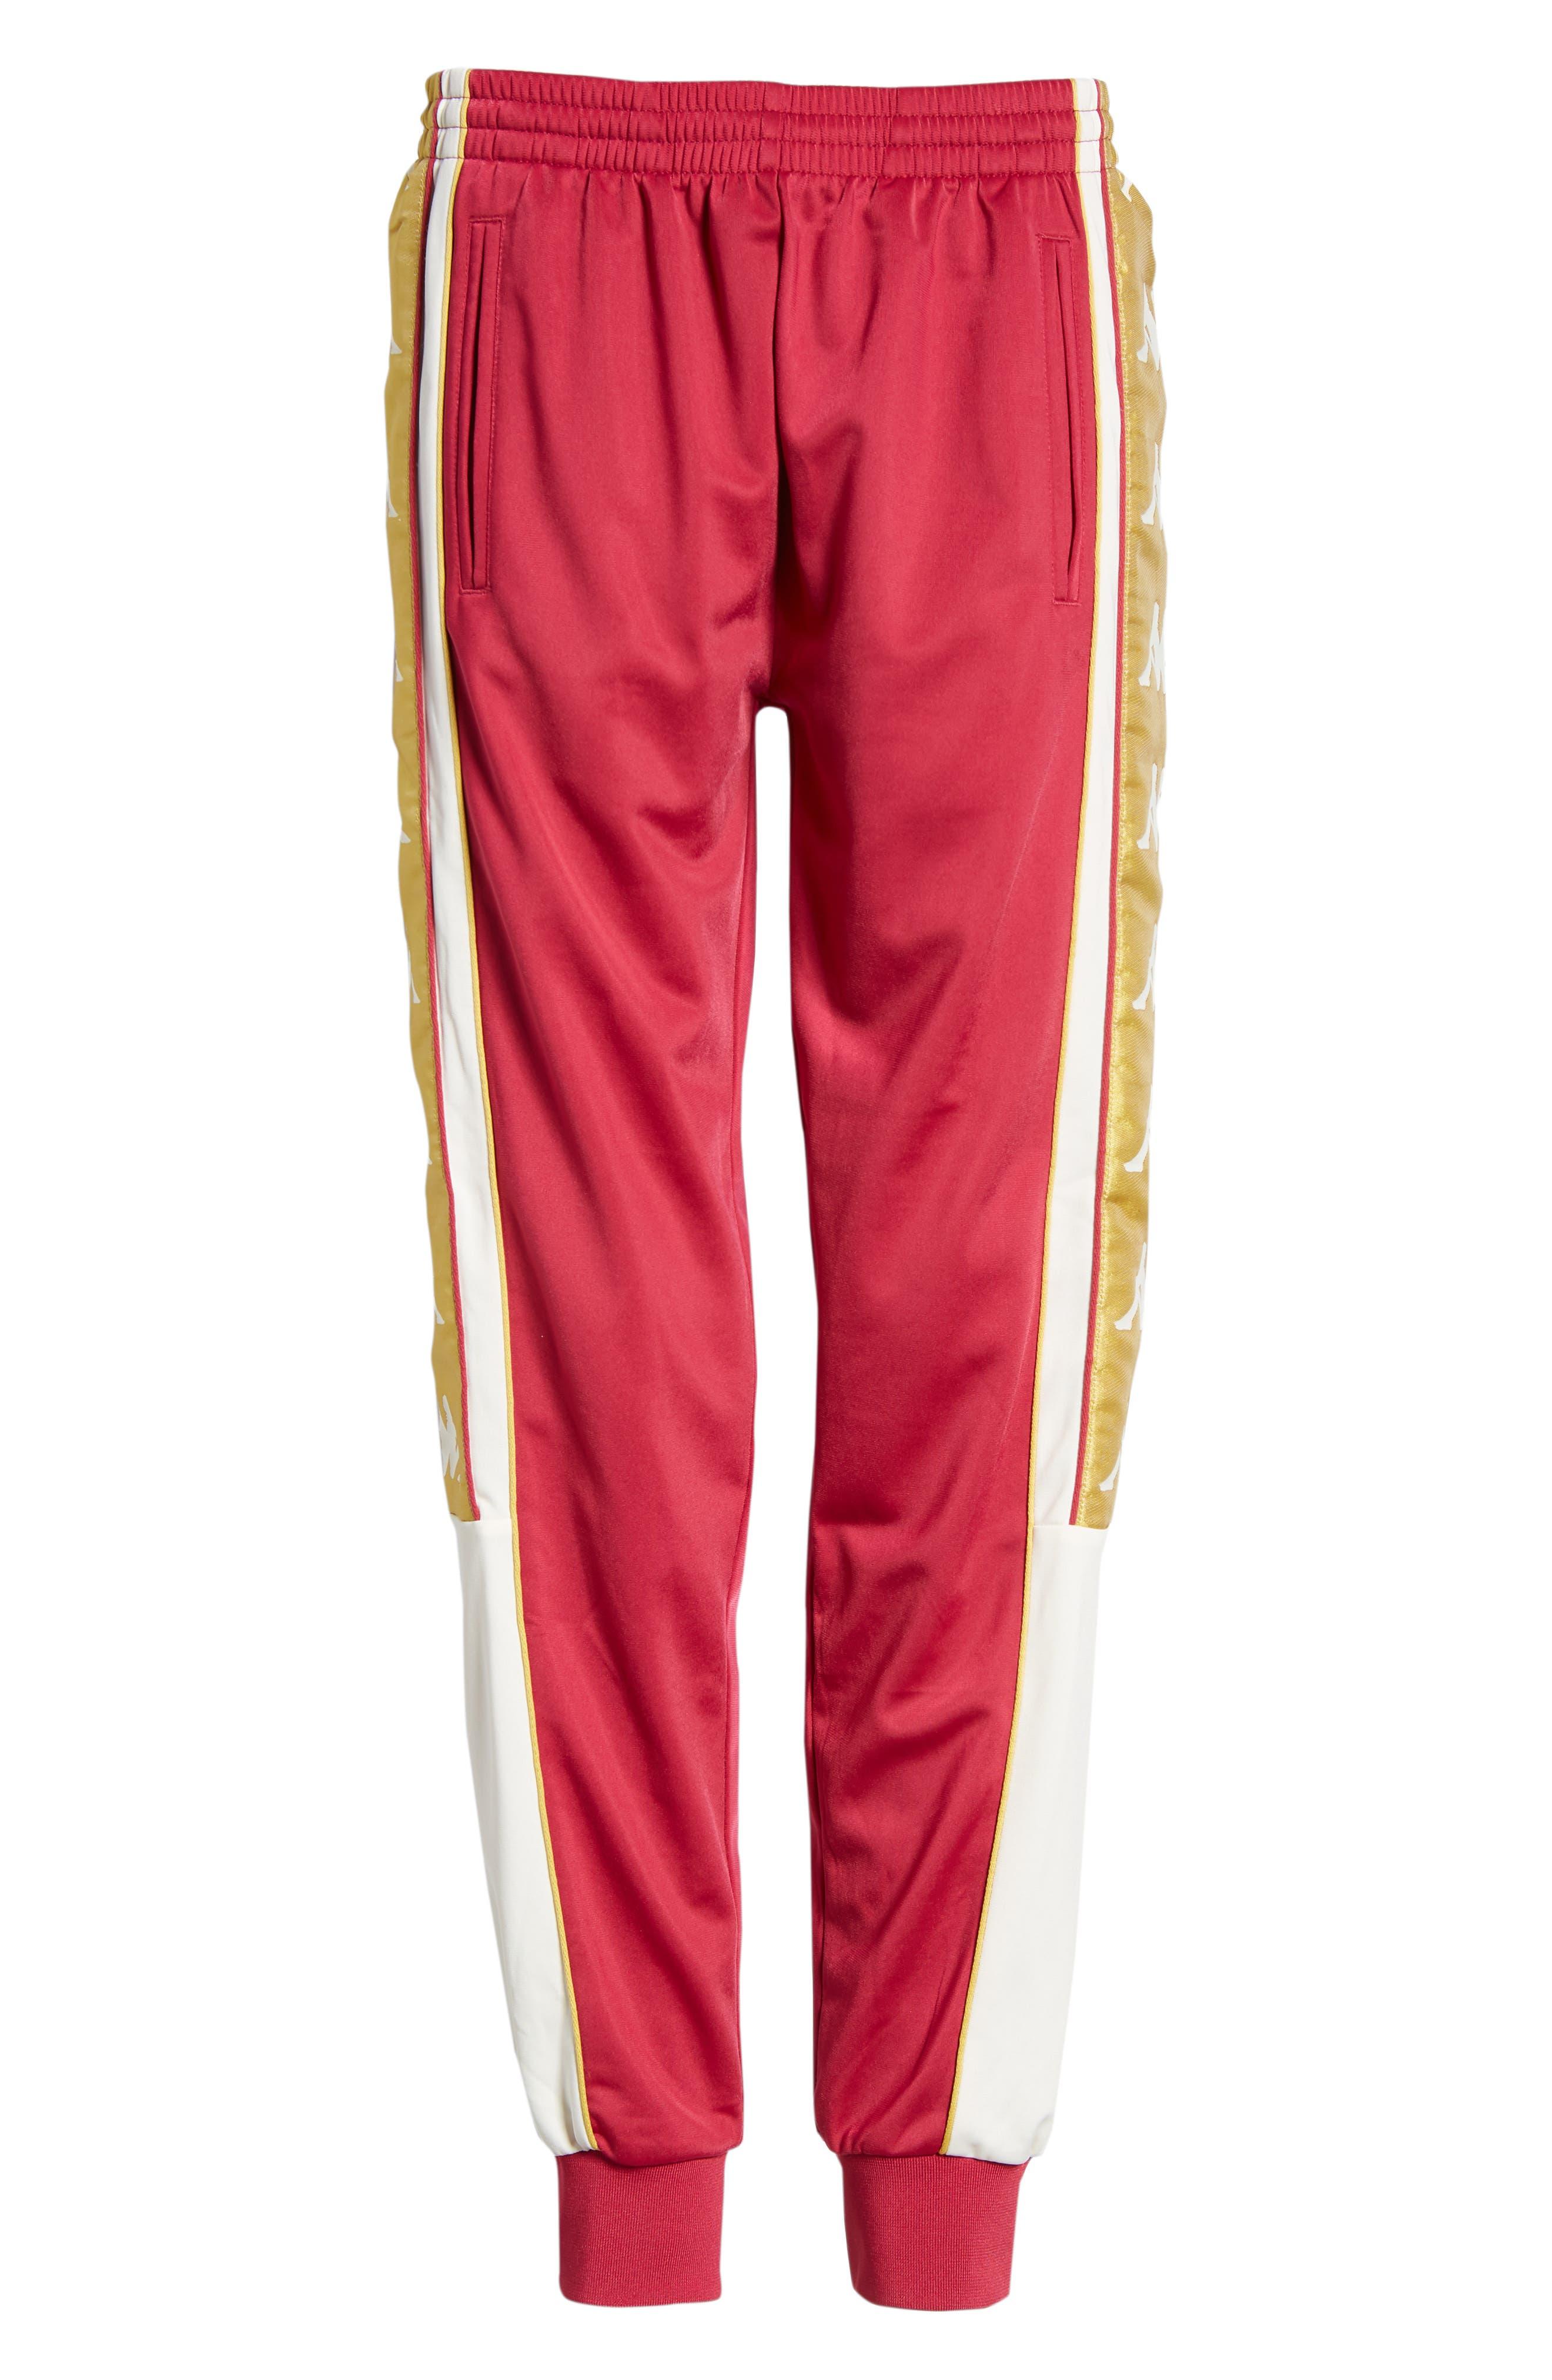 Track Pants,                             Alternate thumbnail 6, color,                             REDCERISE-WHITE-GOLD